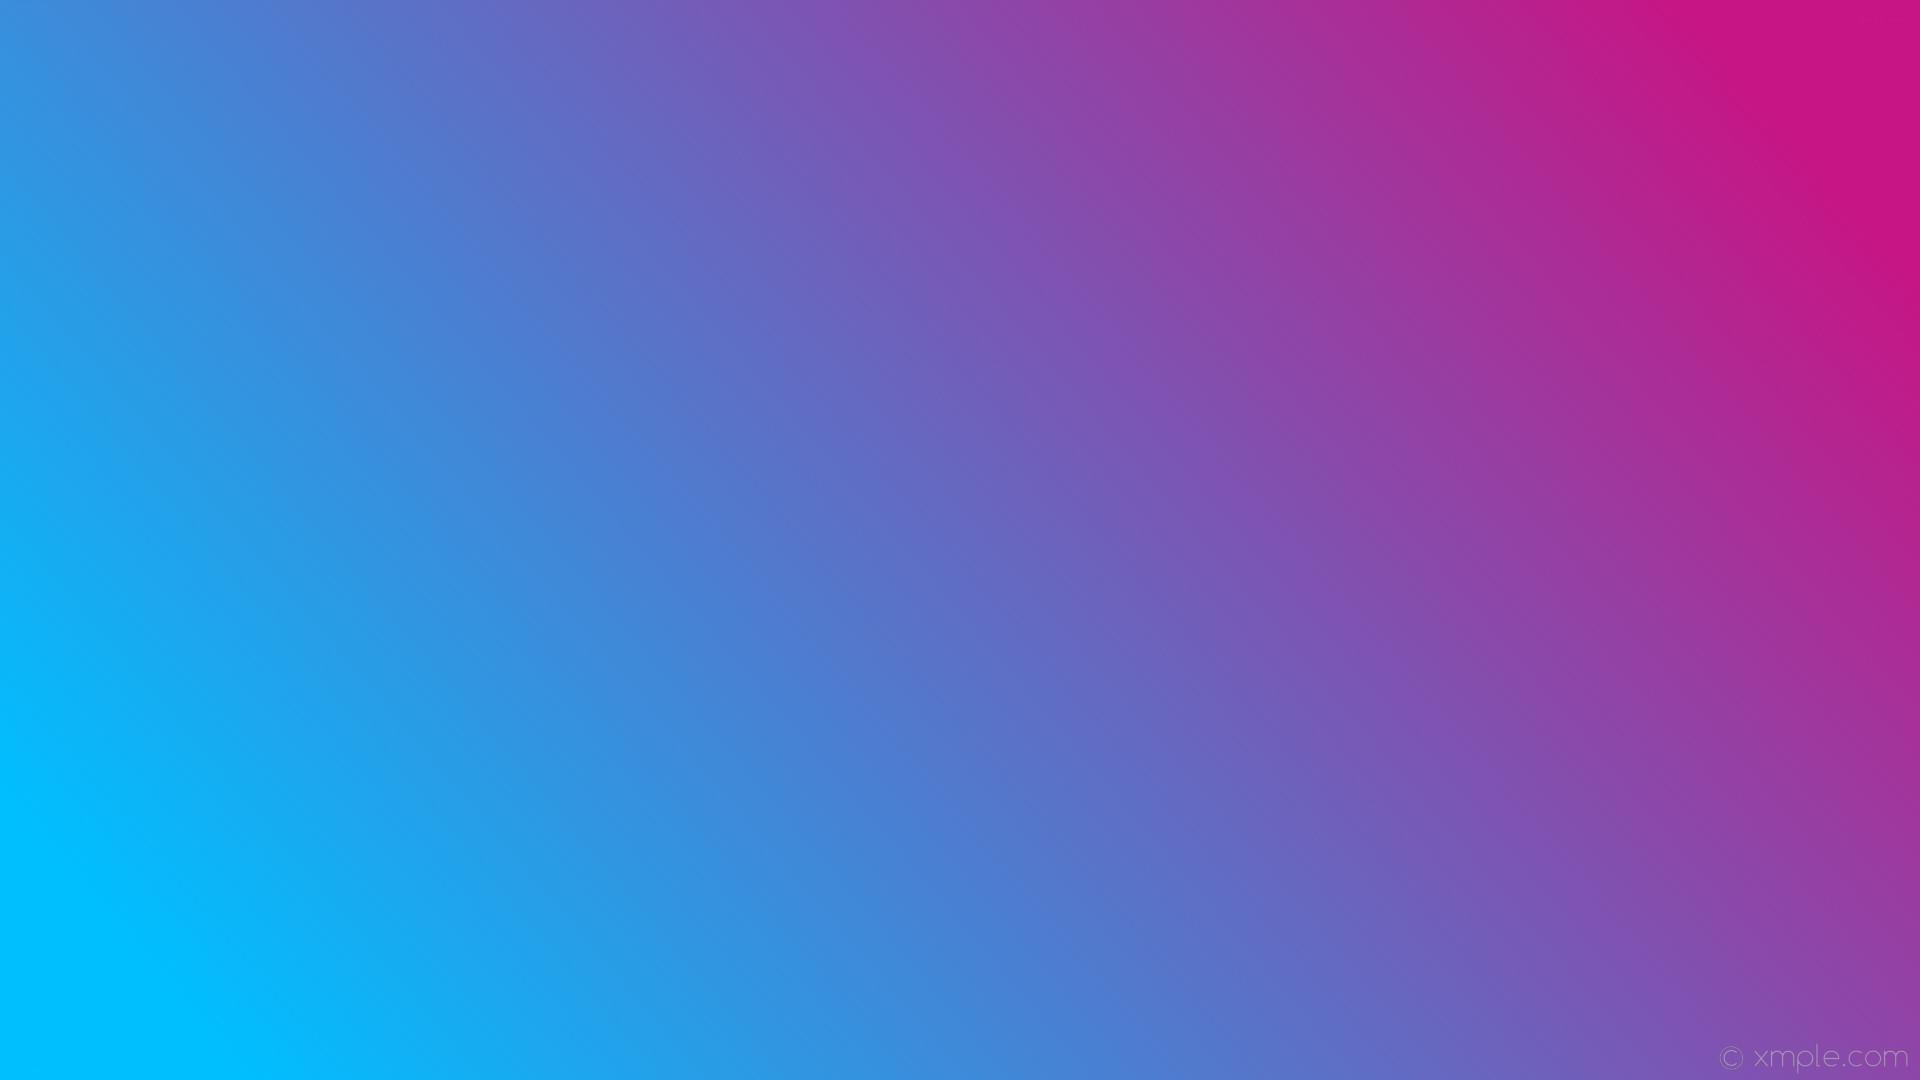 wallpaper linear gradient pink blue medium violet red deep sky blue #c71585  #00bfff 15